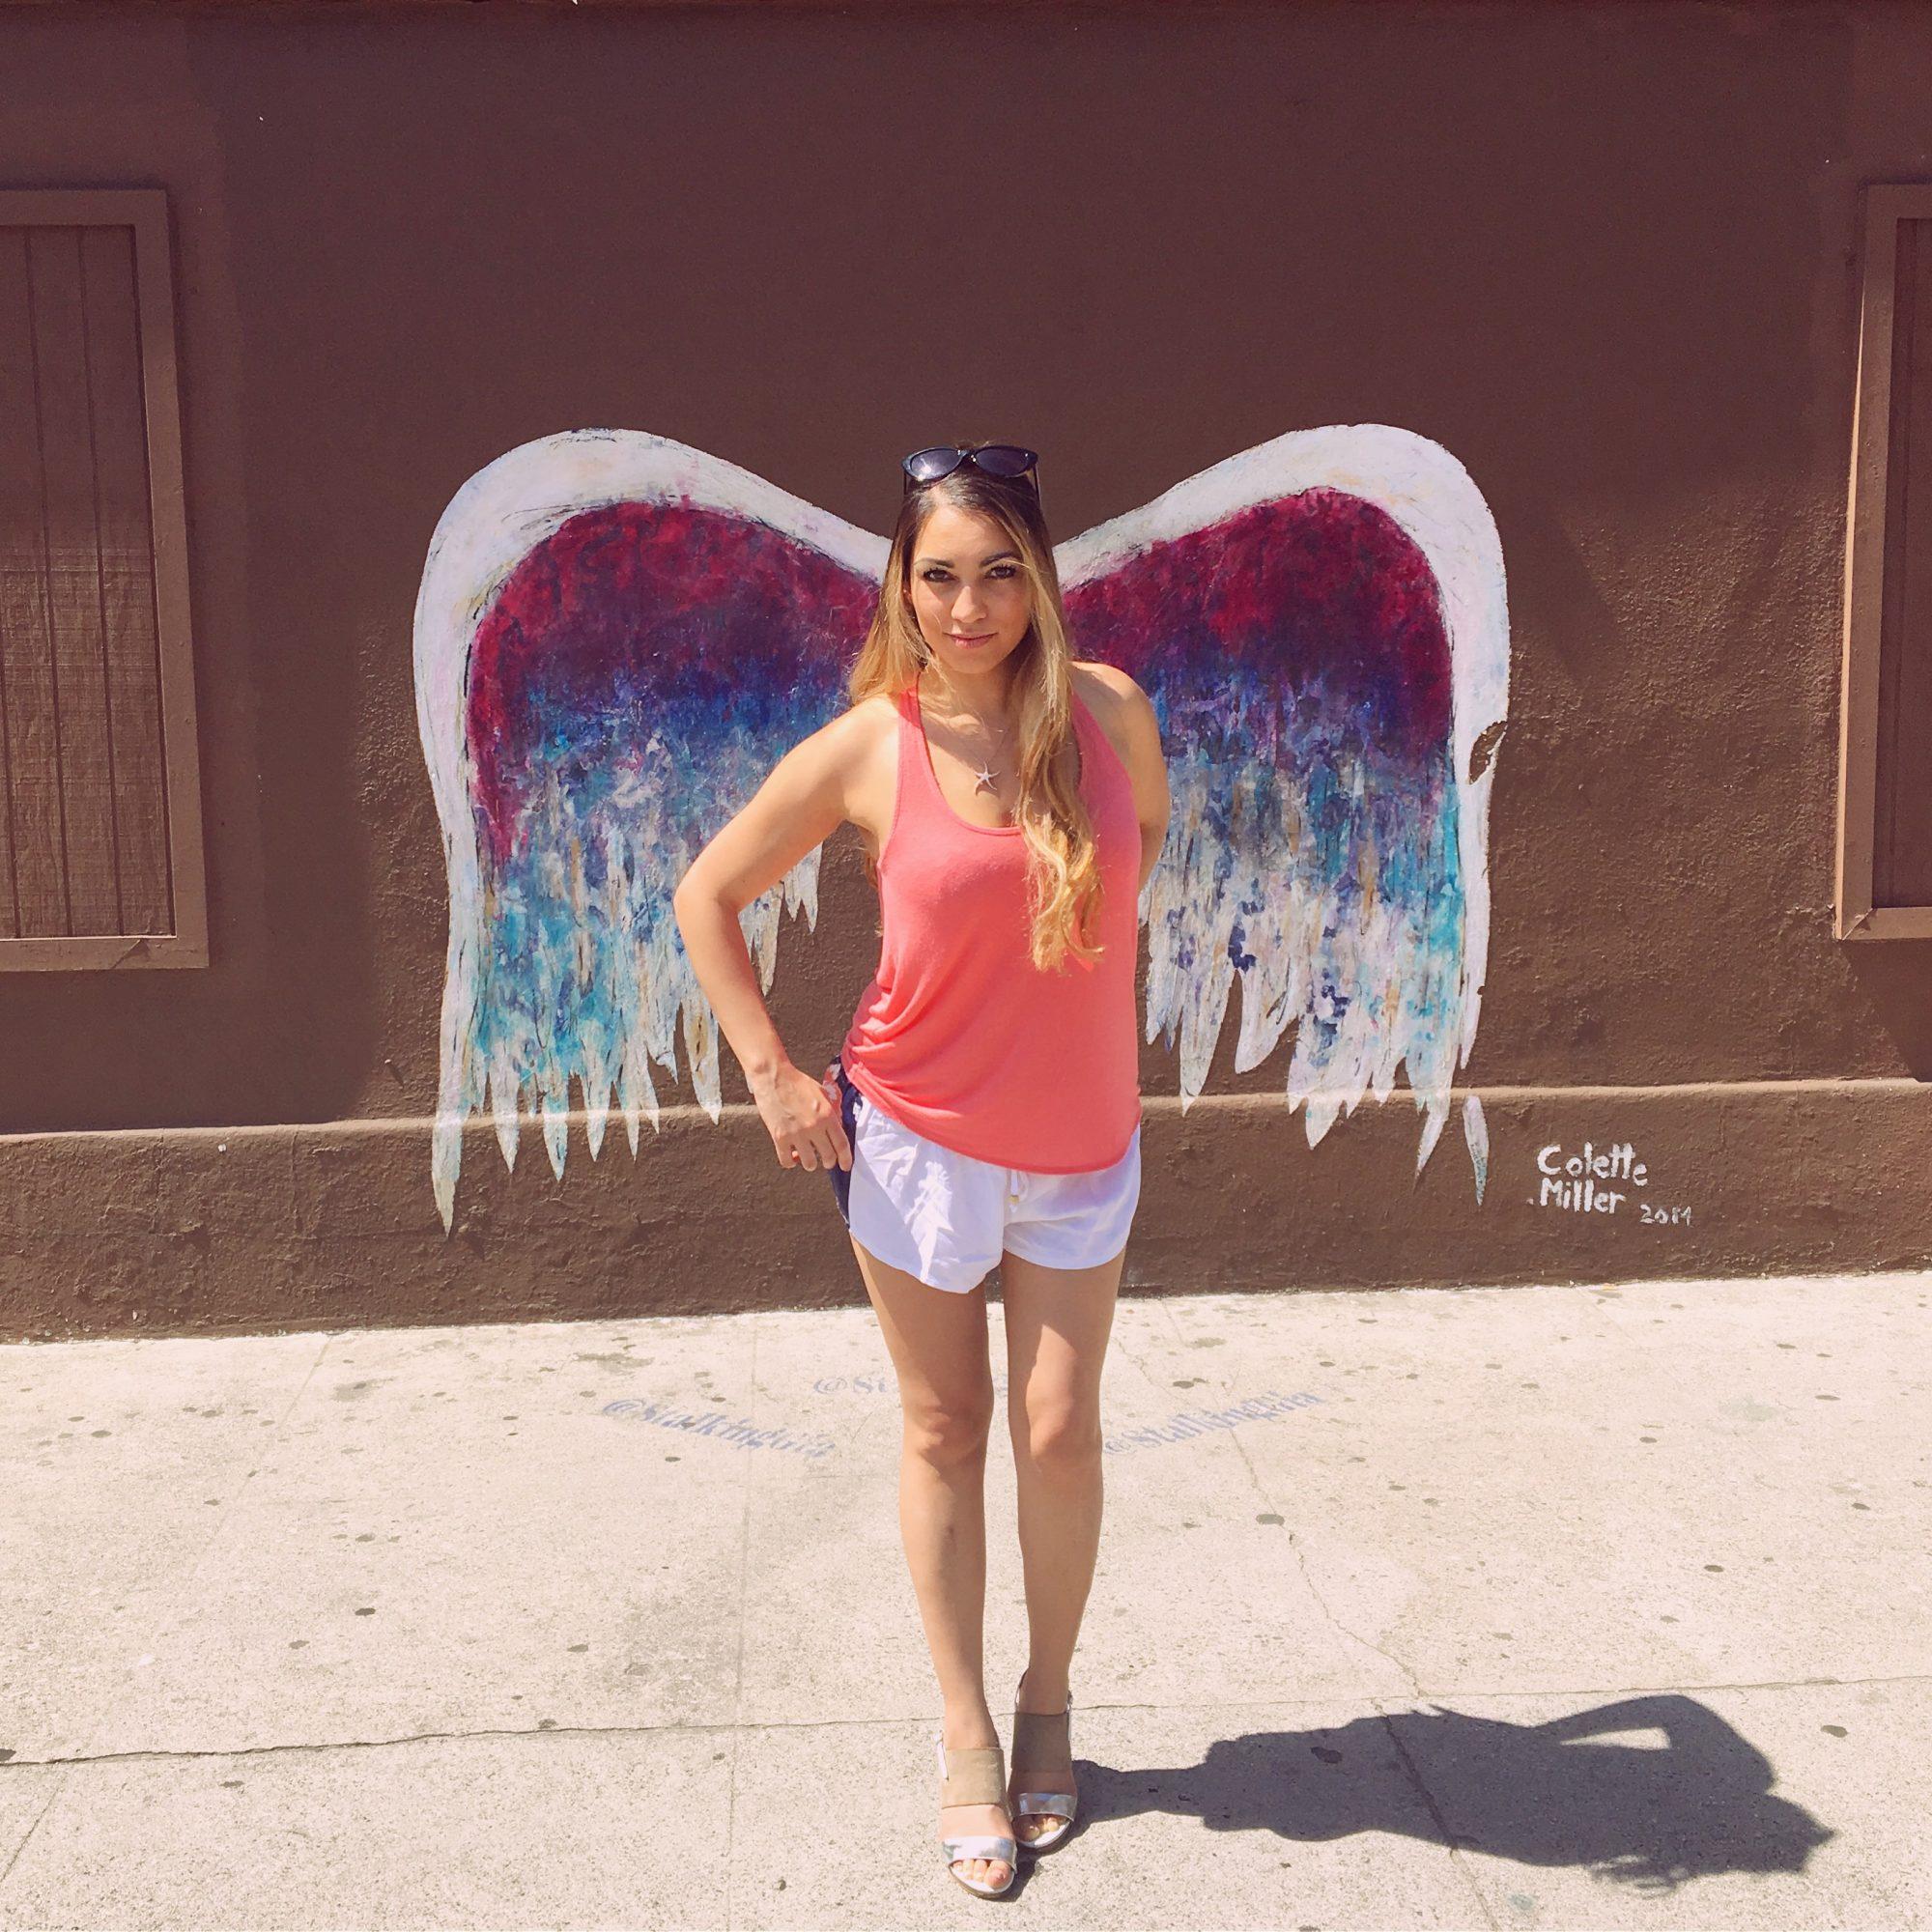 Colette Miller wall